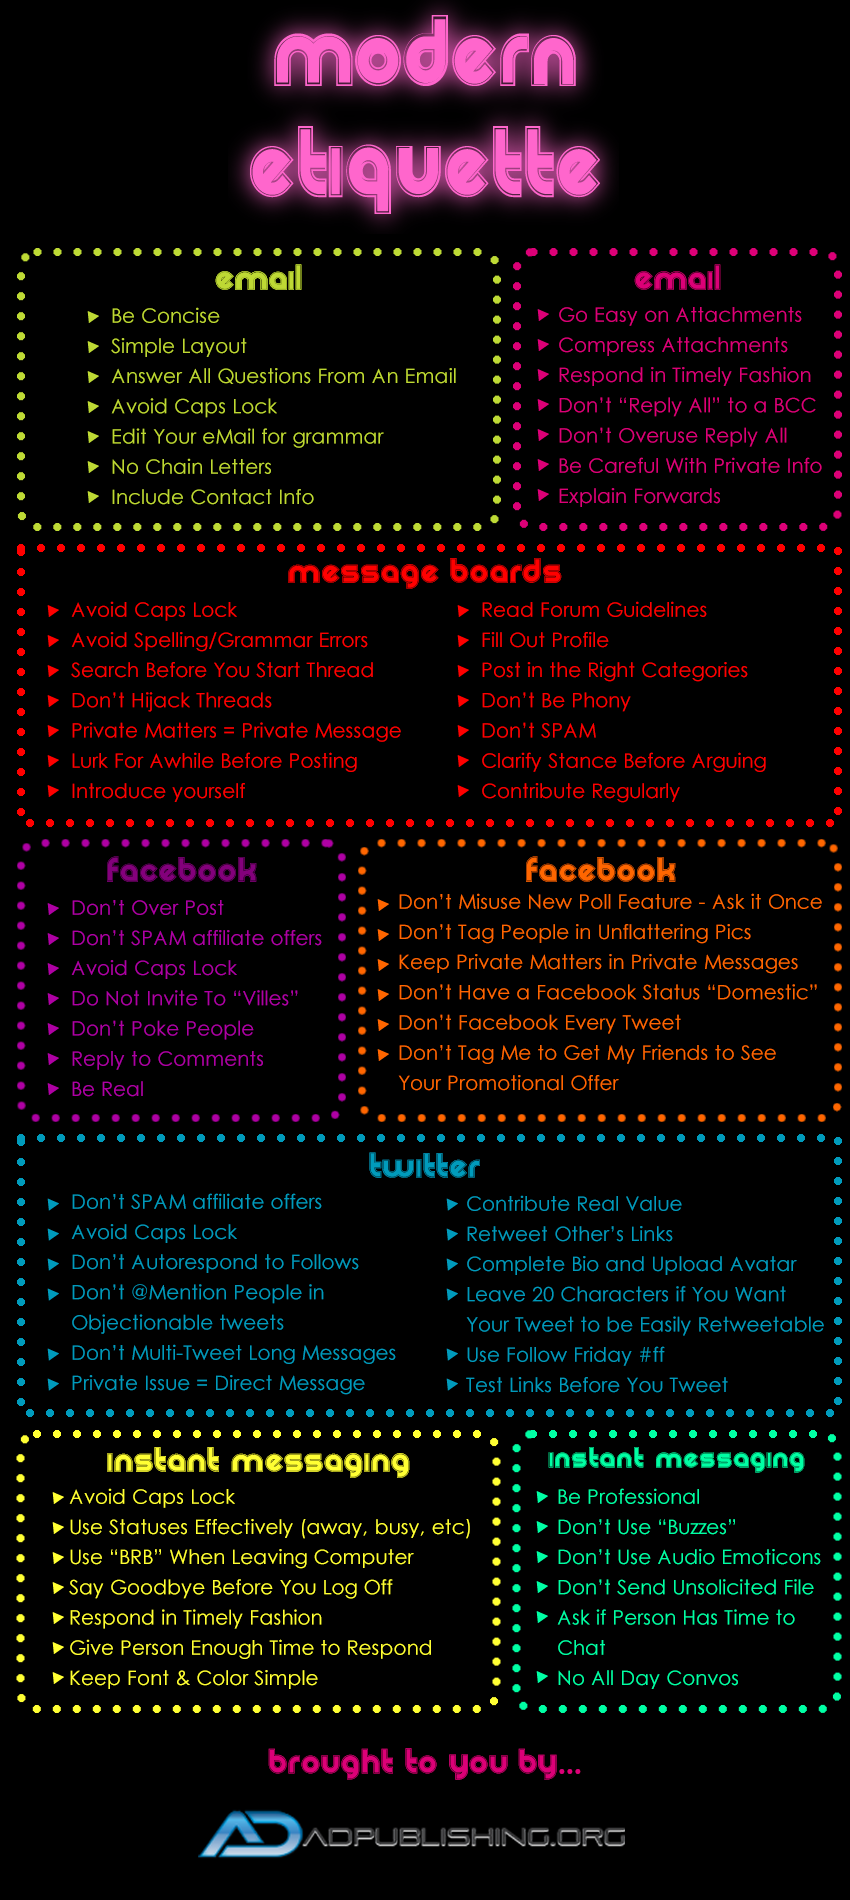 Online etiquette infographic guide